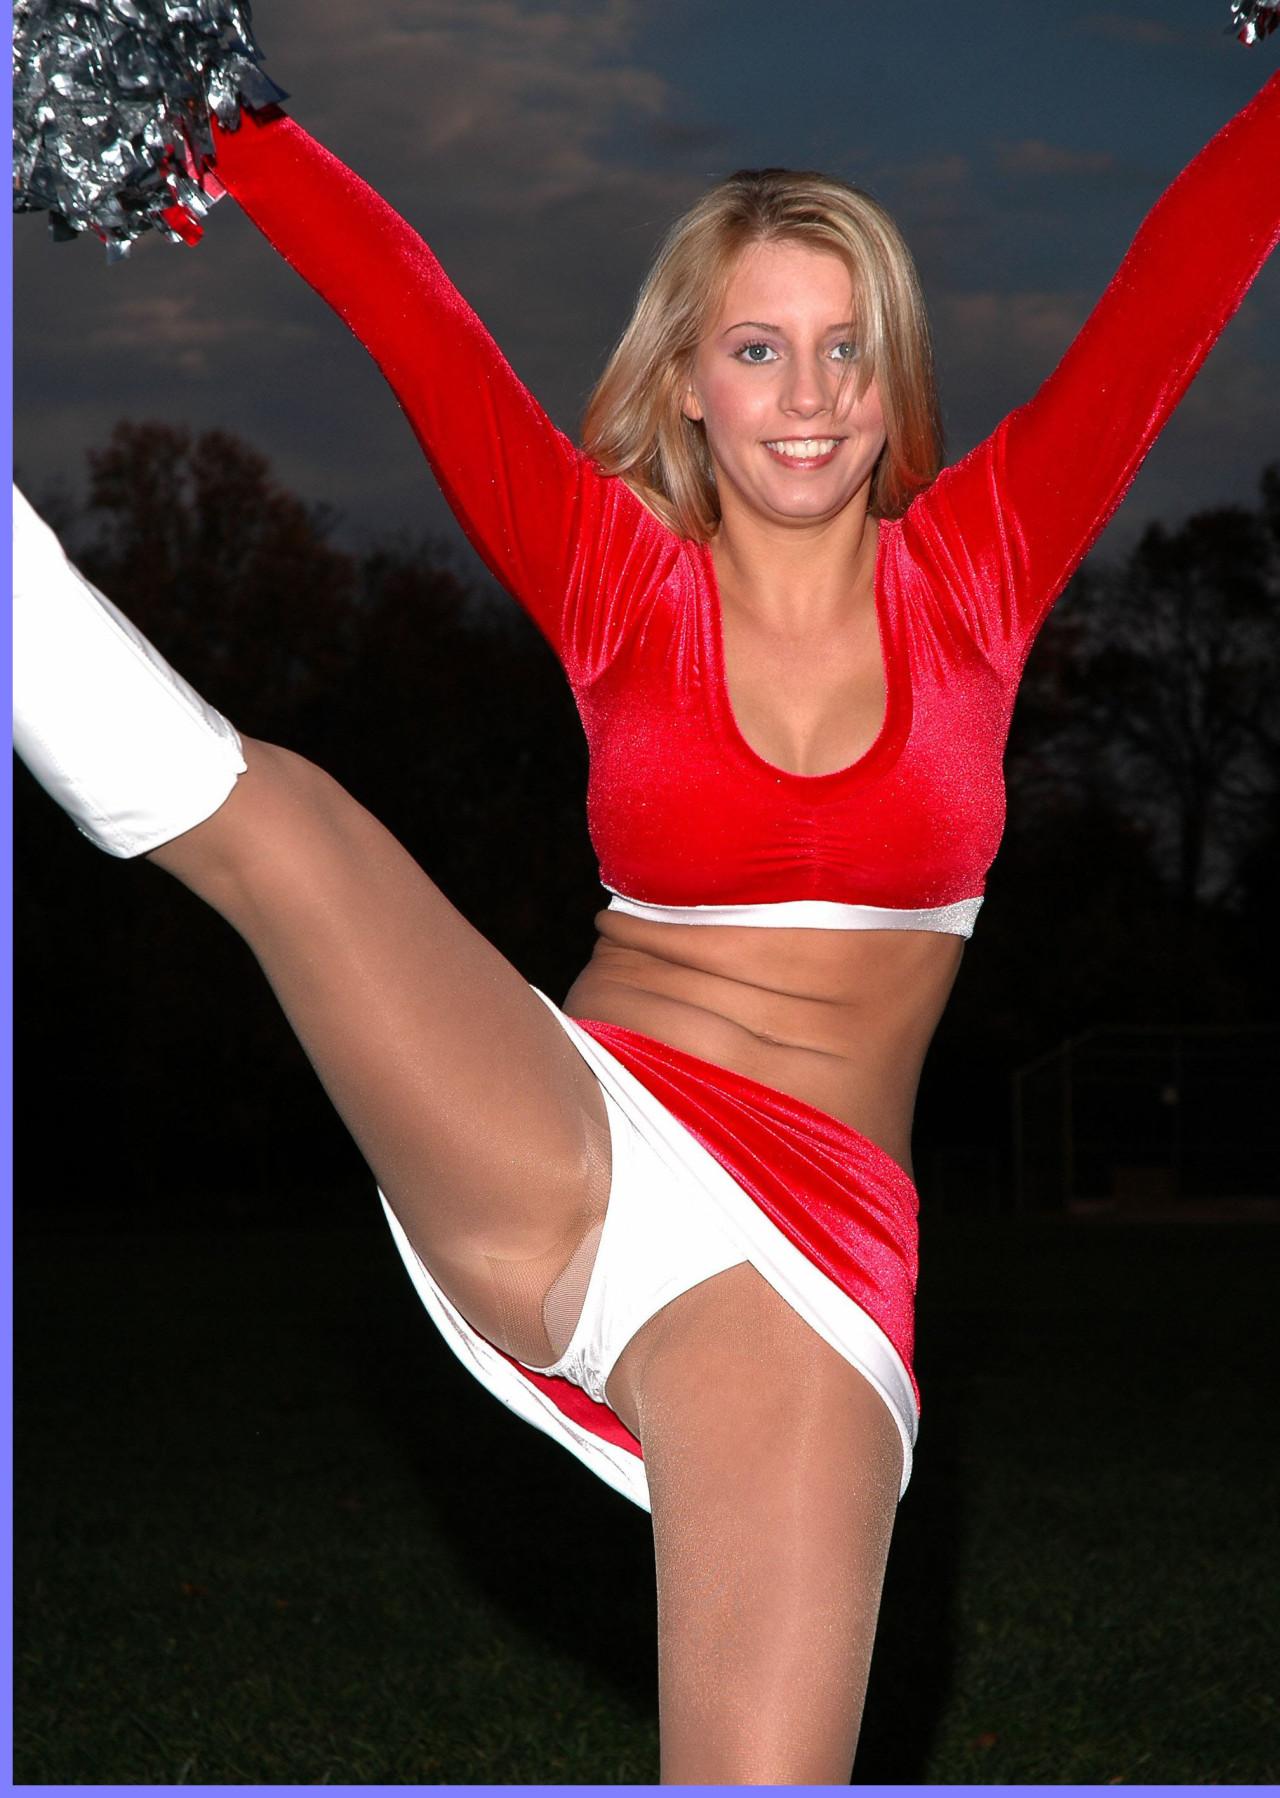 Abstract Upskirt cheerleaders dresses amusing